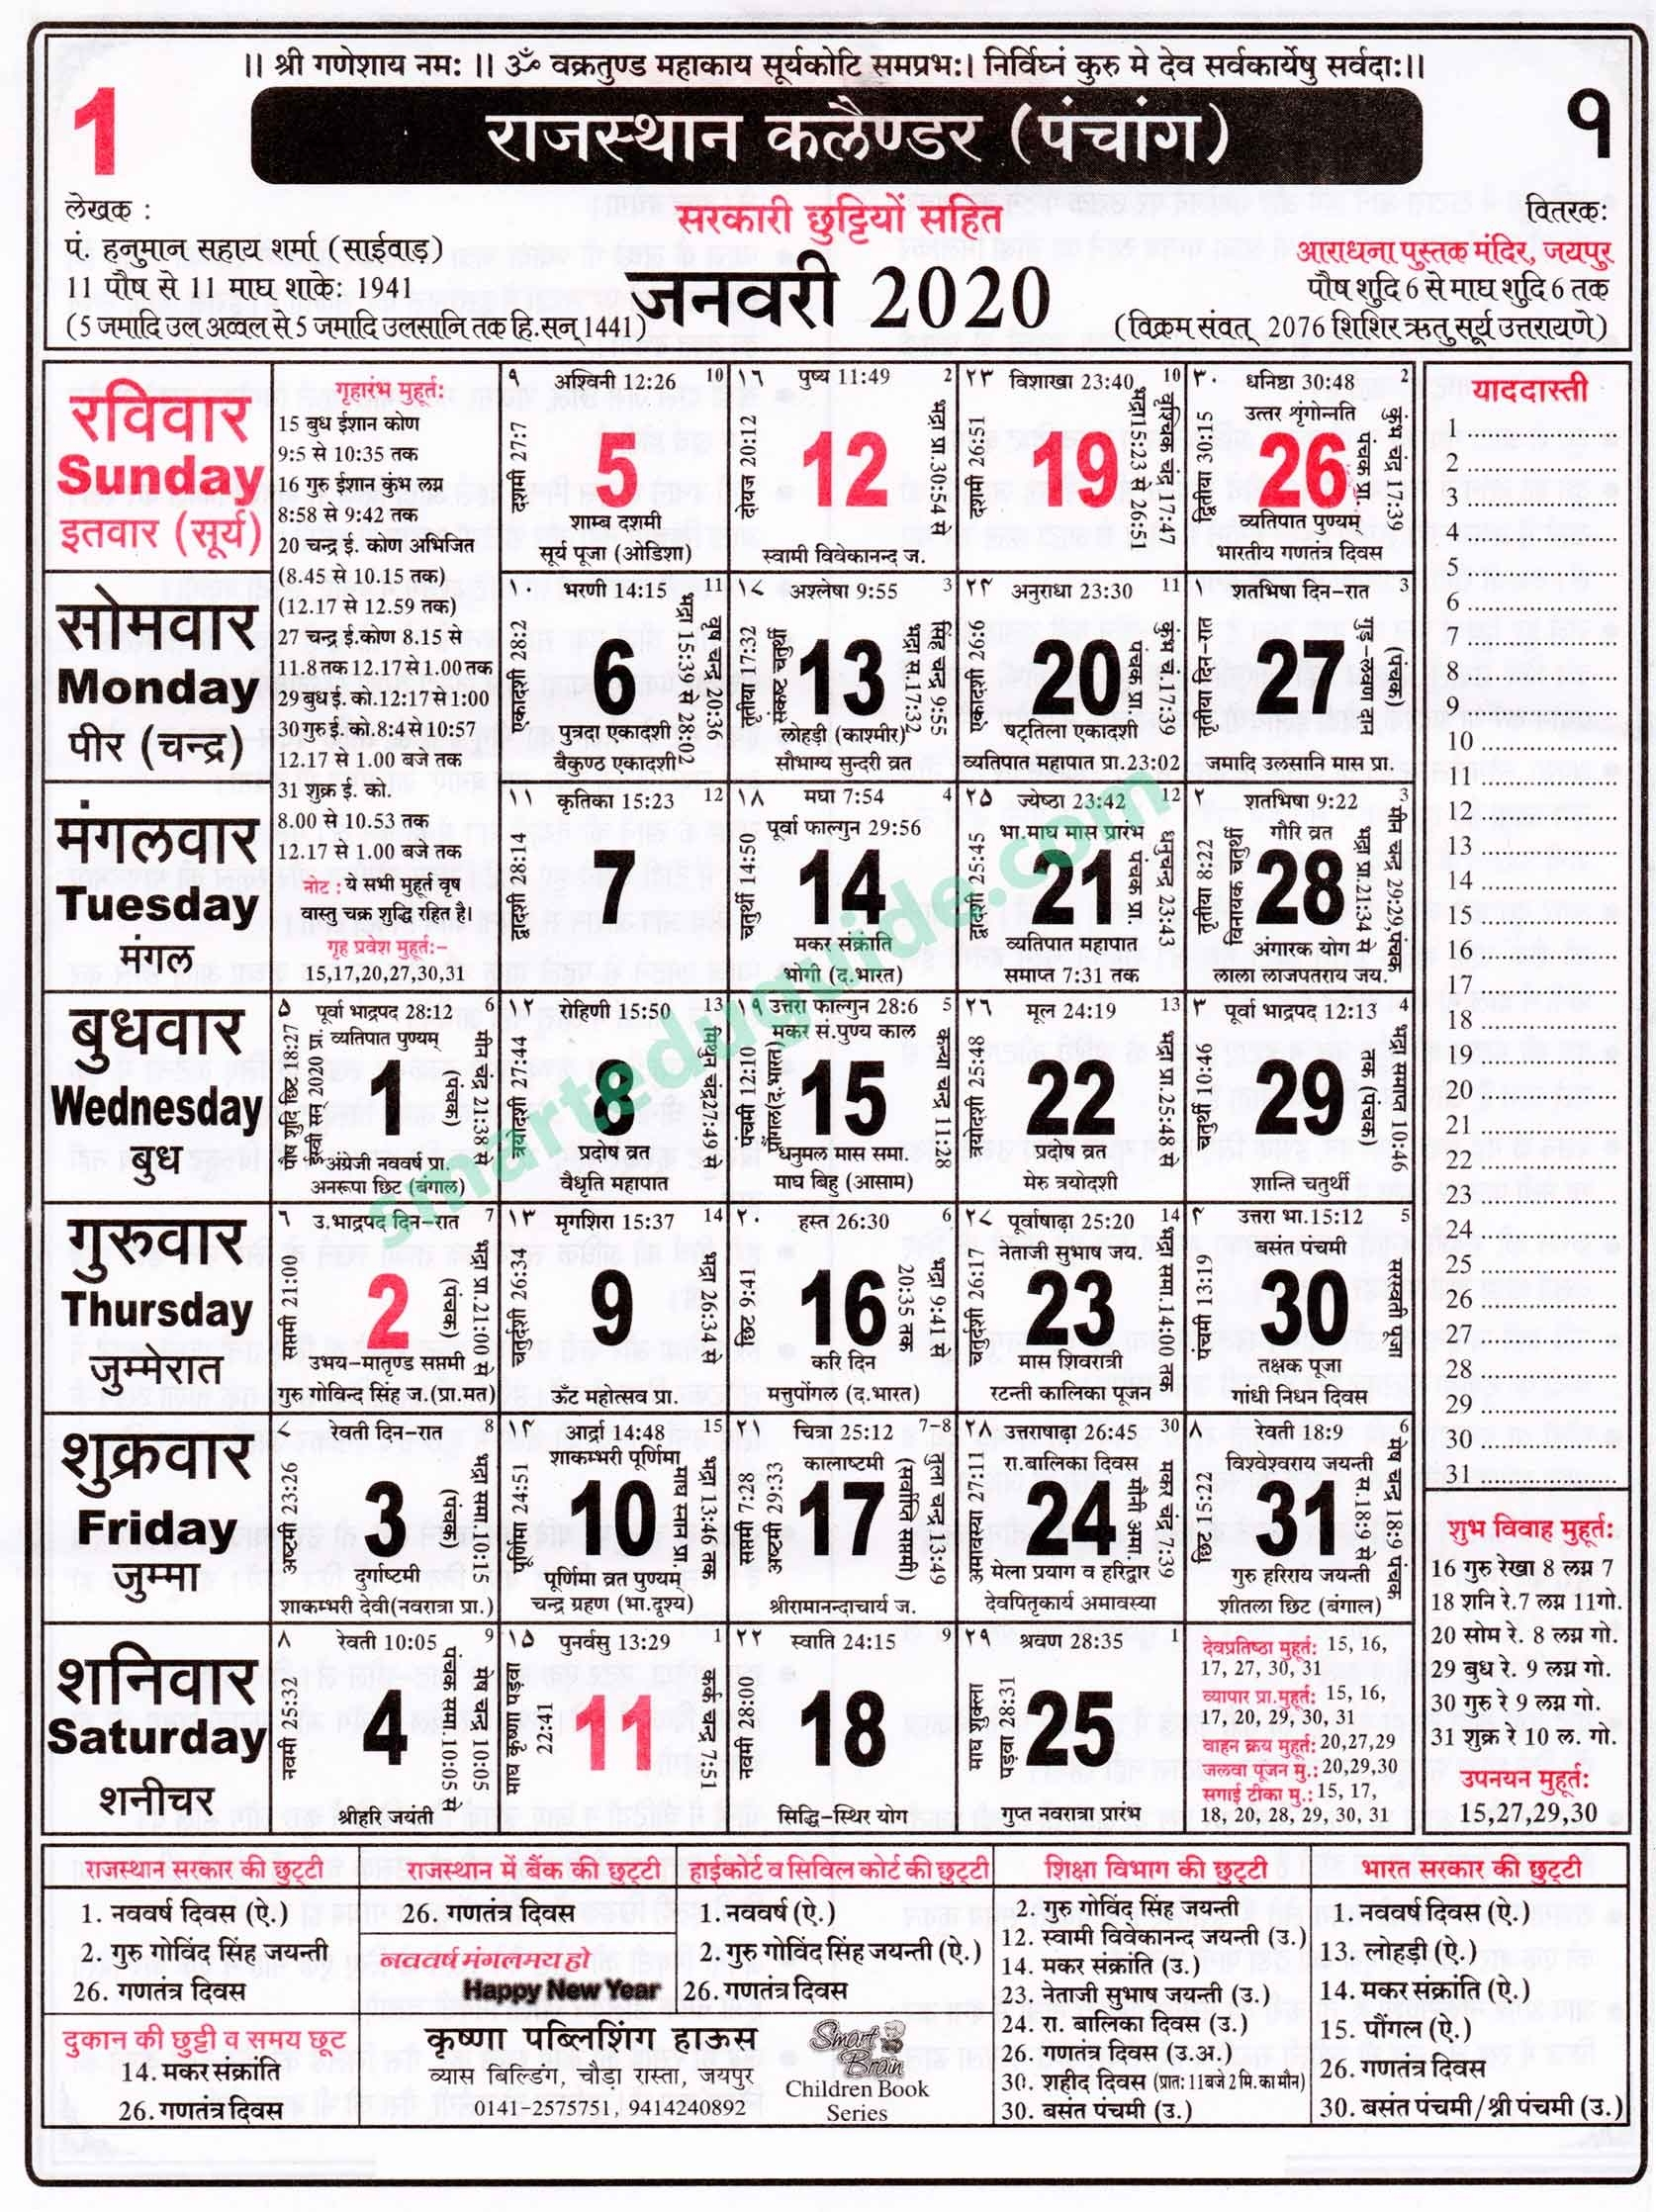 Take Rajasthan Govt Calendar 2021 With Holidays